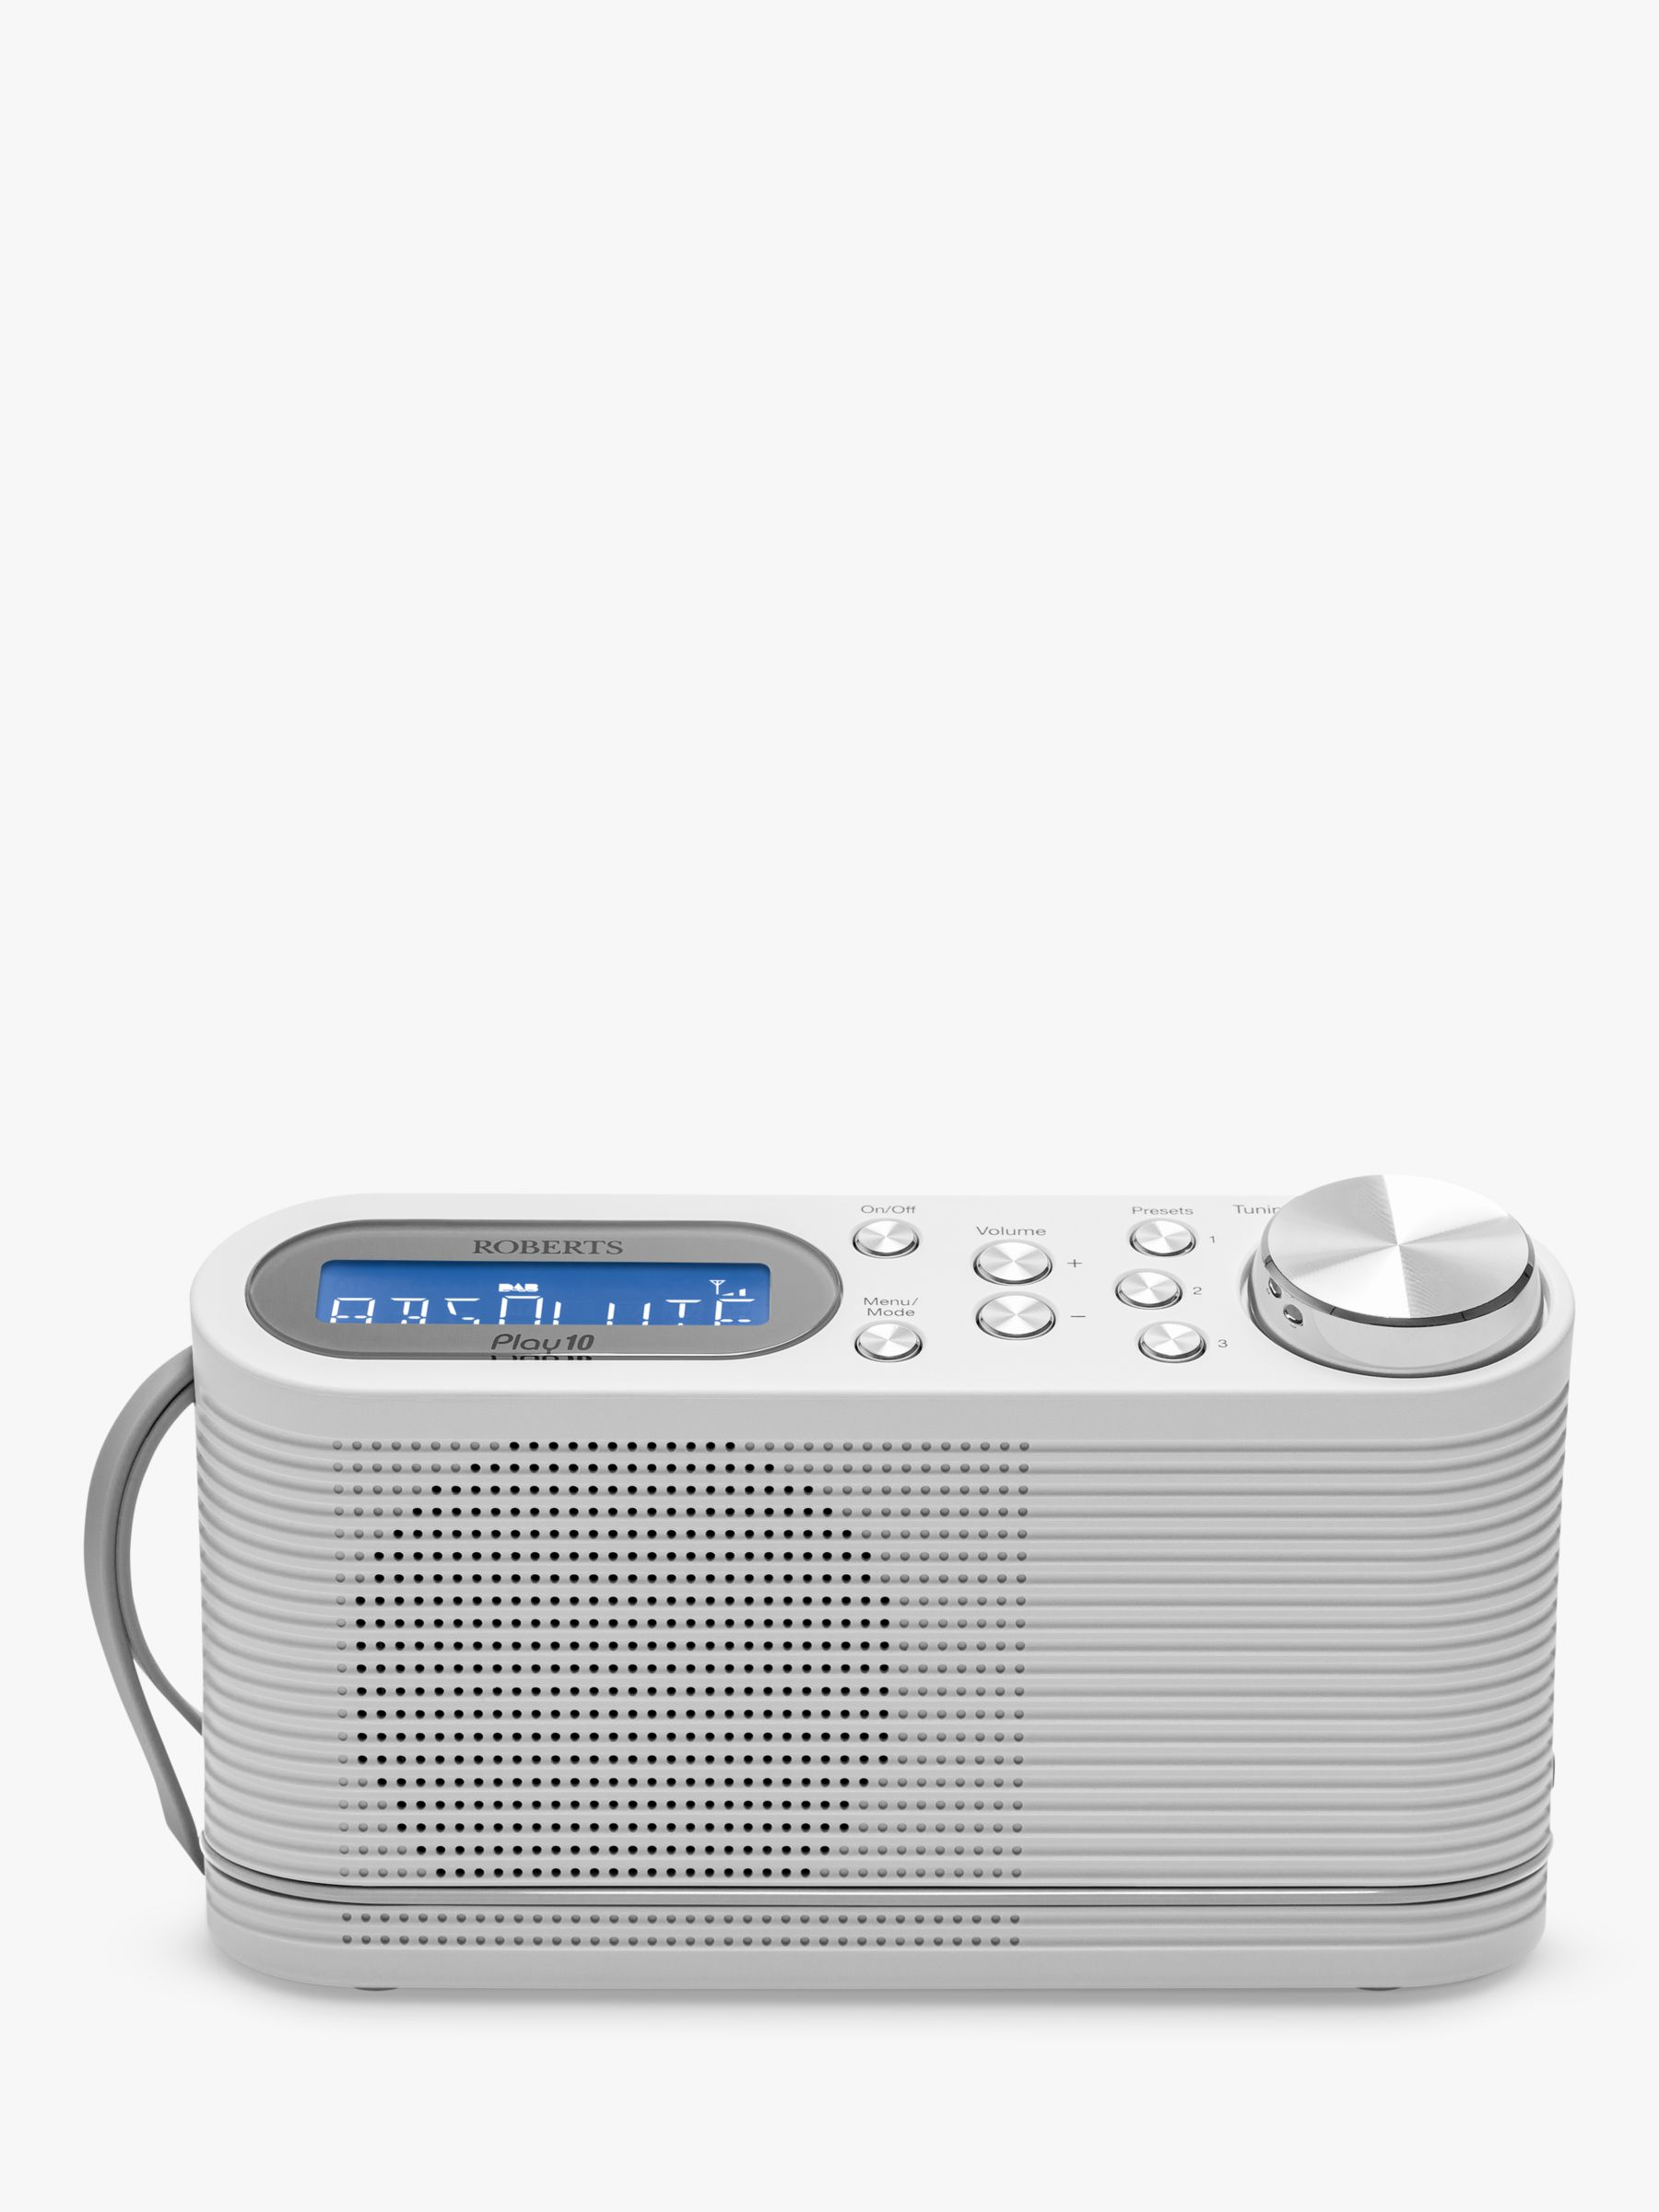 Roberts ROBERTS Play 10 DAB/DAB+/FM Portable Digital Radio